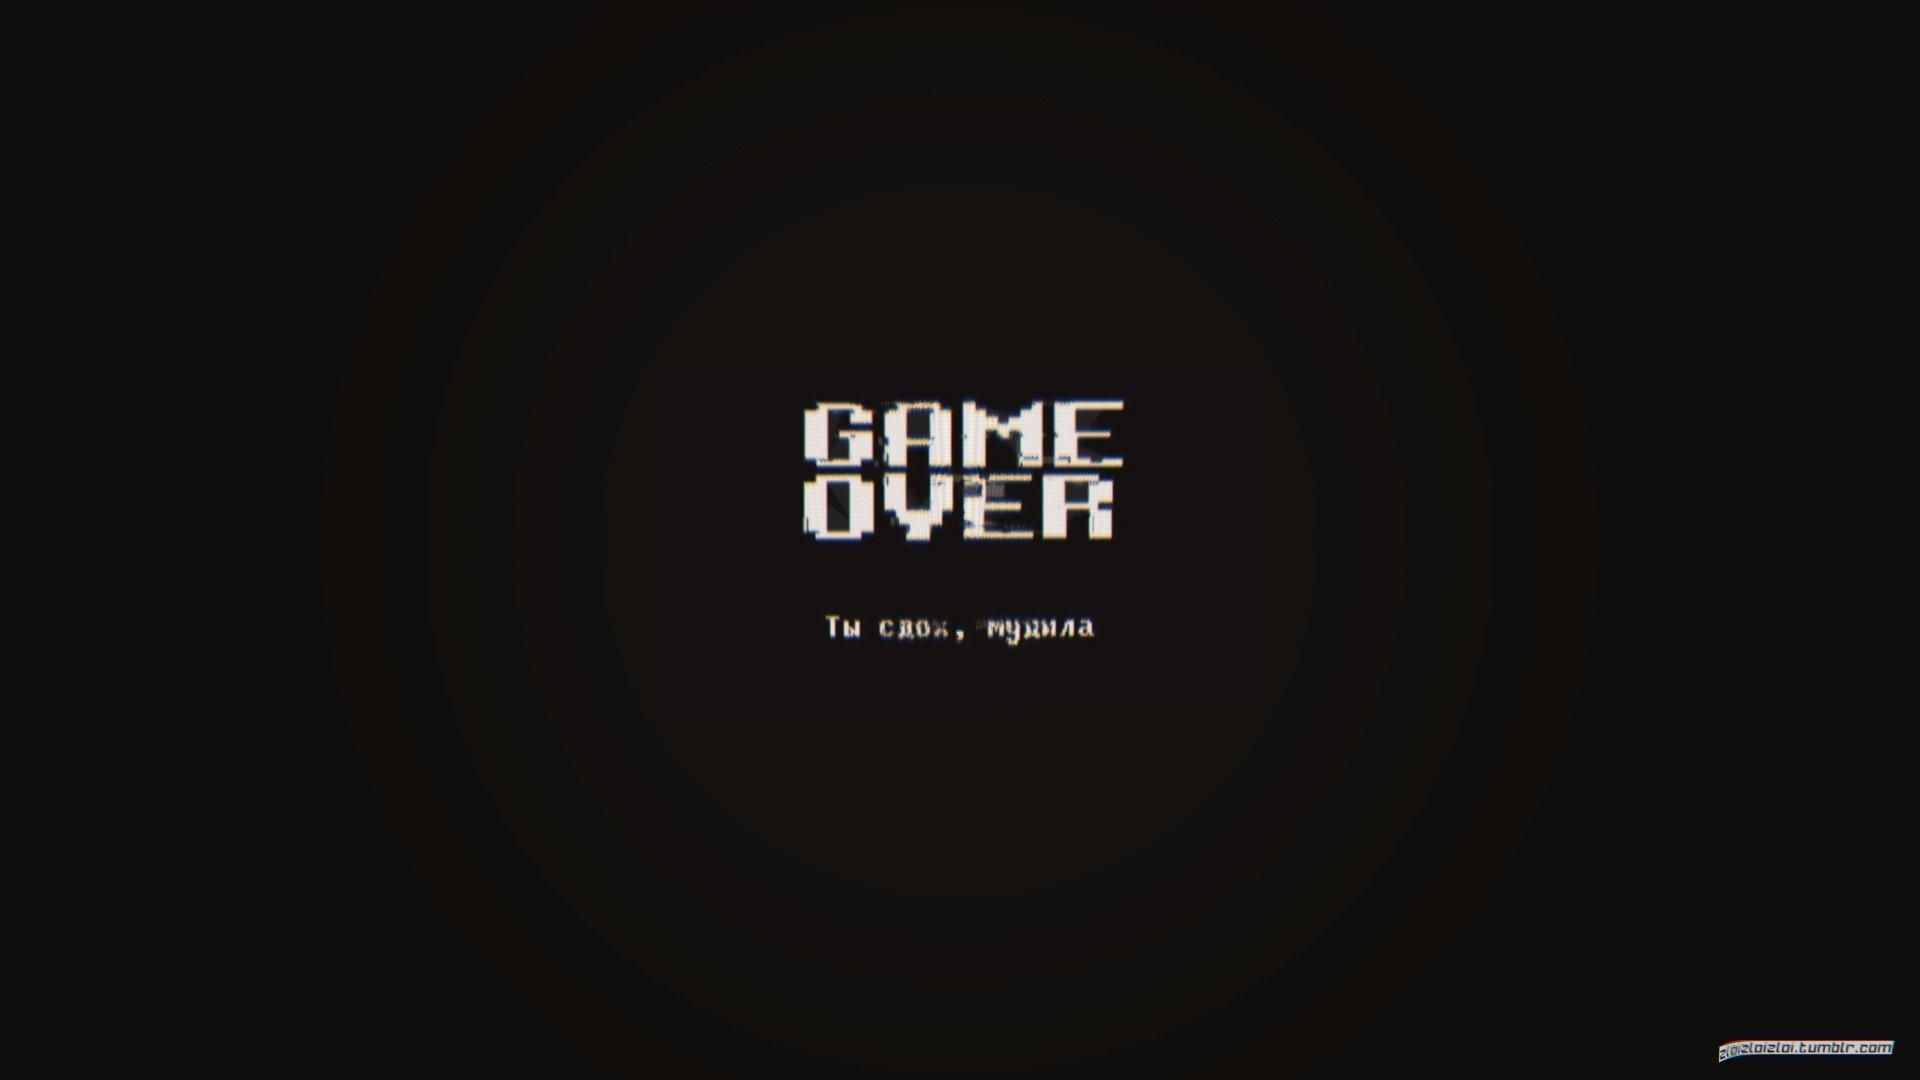 glitch art, Minimalism, Dark, GAME OVER, Abstract HD ...